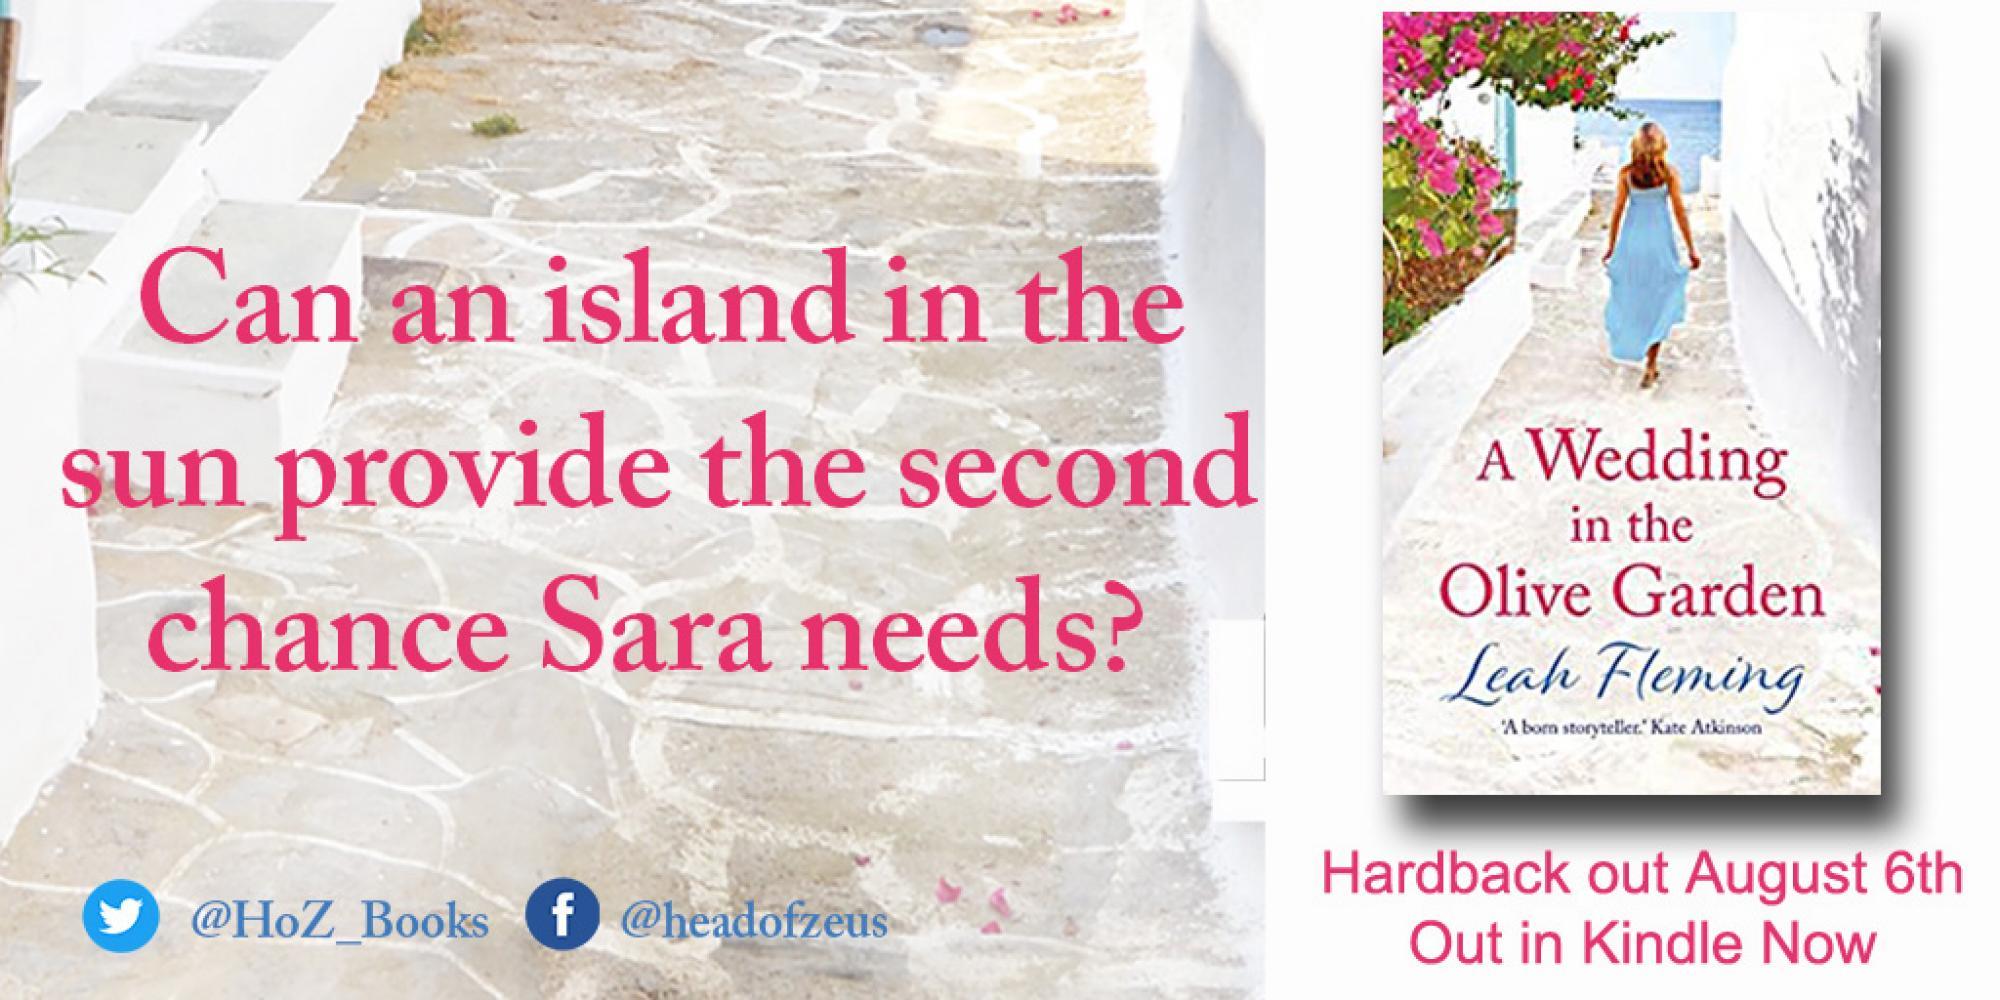 https://www.amazon.co.uk/Wedding-Olive-Garden-Leah-Fleming/dp/1788548701/ref=sr_1_1?keywords=a+wedding+in+the+olive+garden&qid=1596284569&sr=8-1